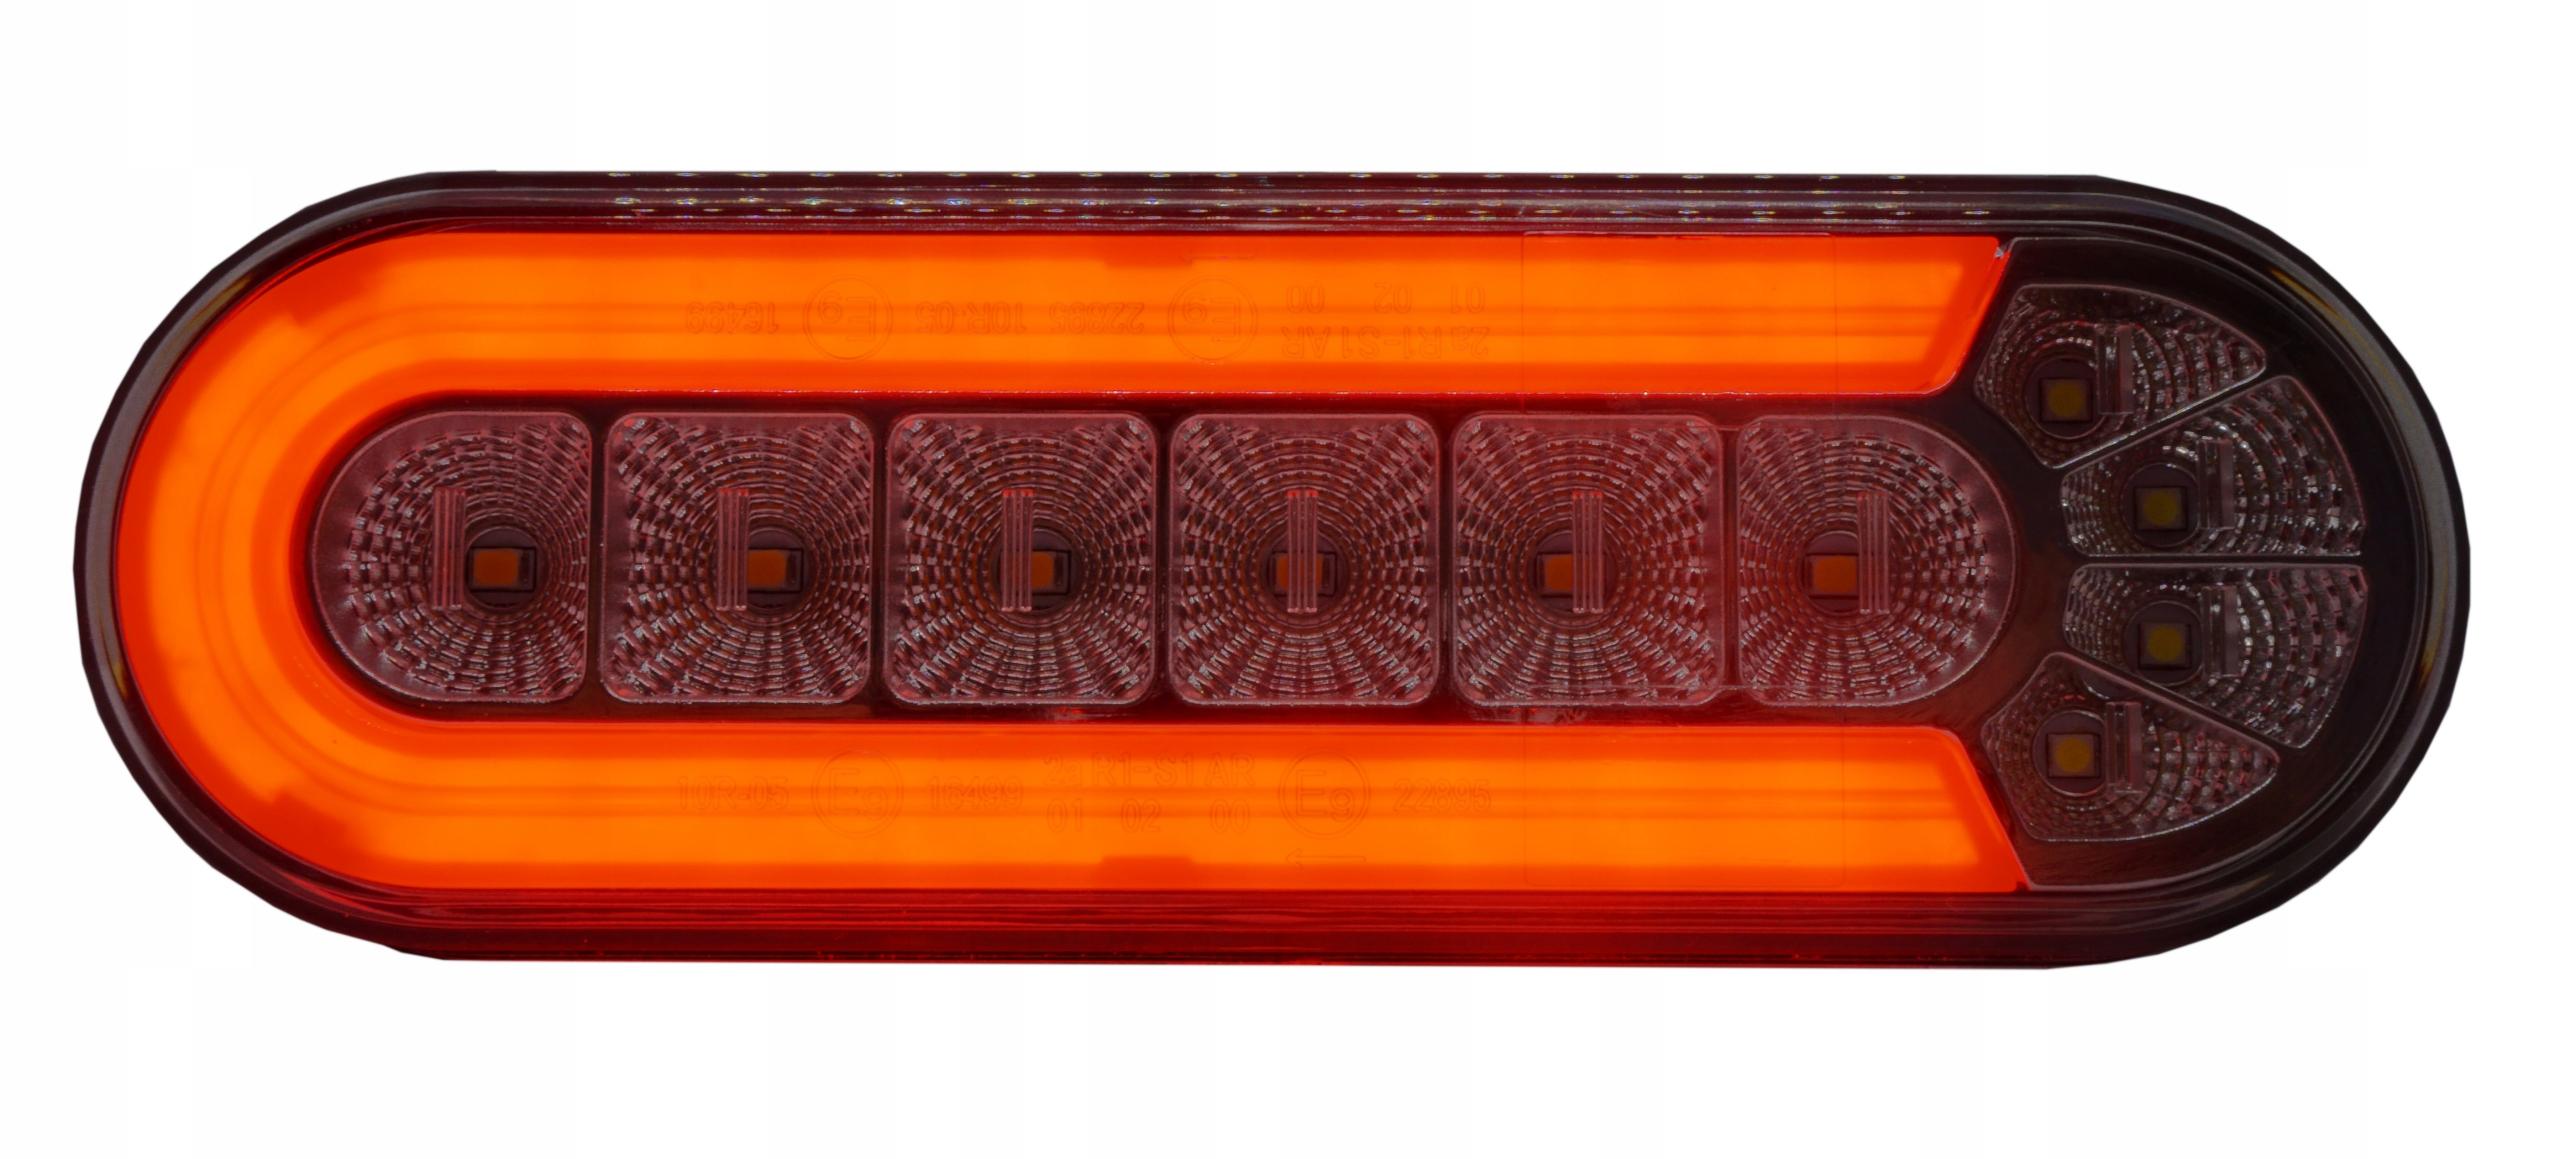 лампа фонарь led неон динамический червей 1224v